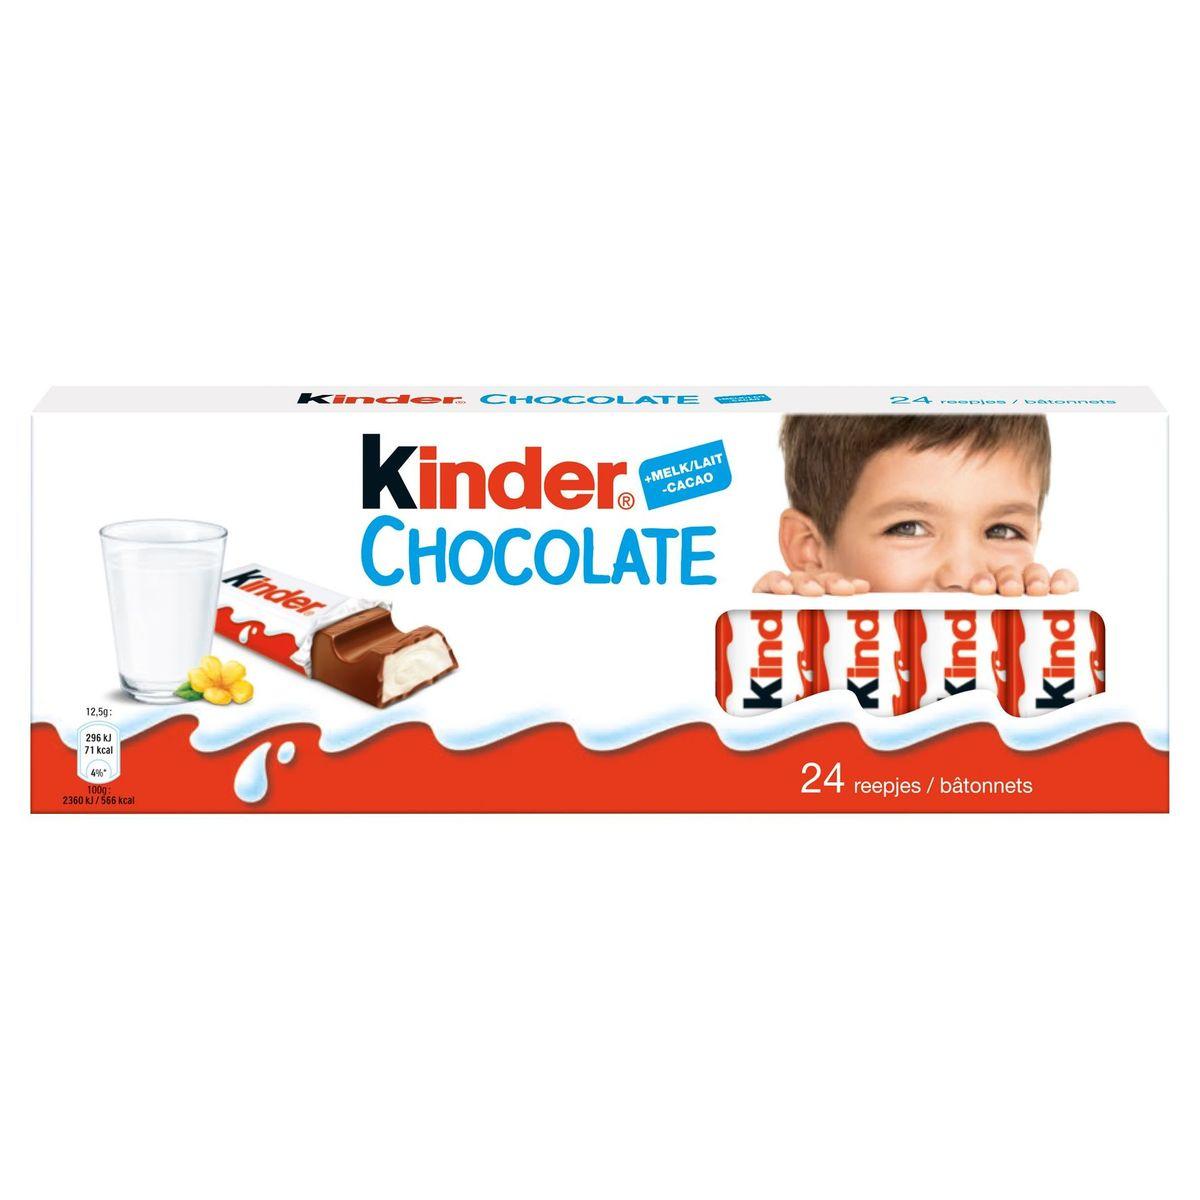 Kinder Chocolate 24 Bâtonnets 300 g